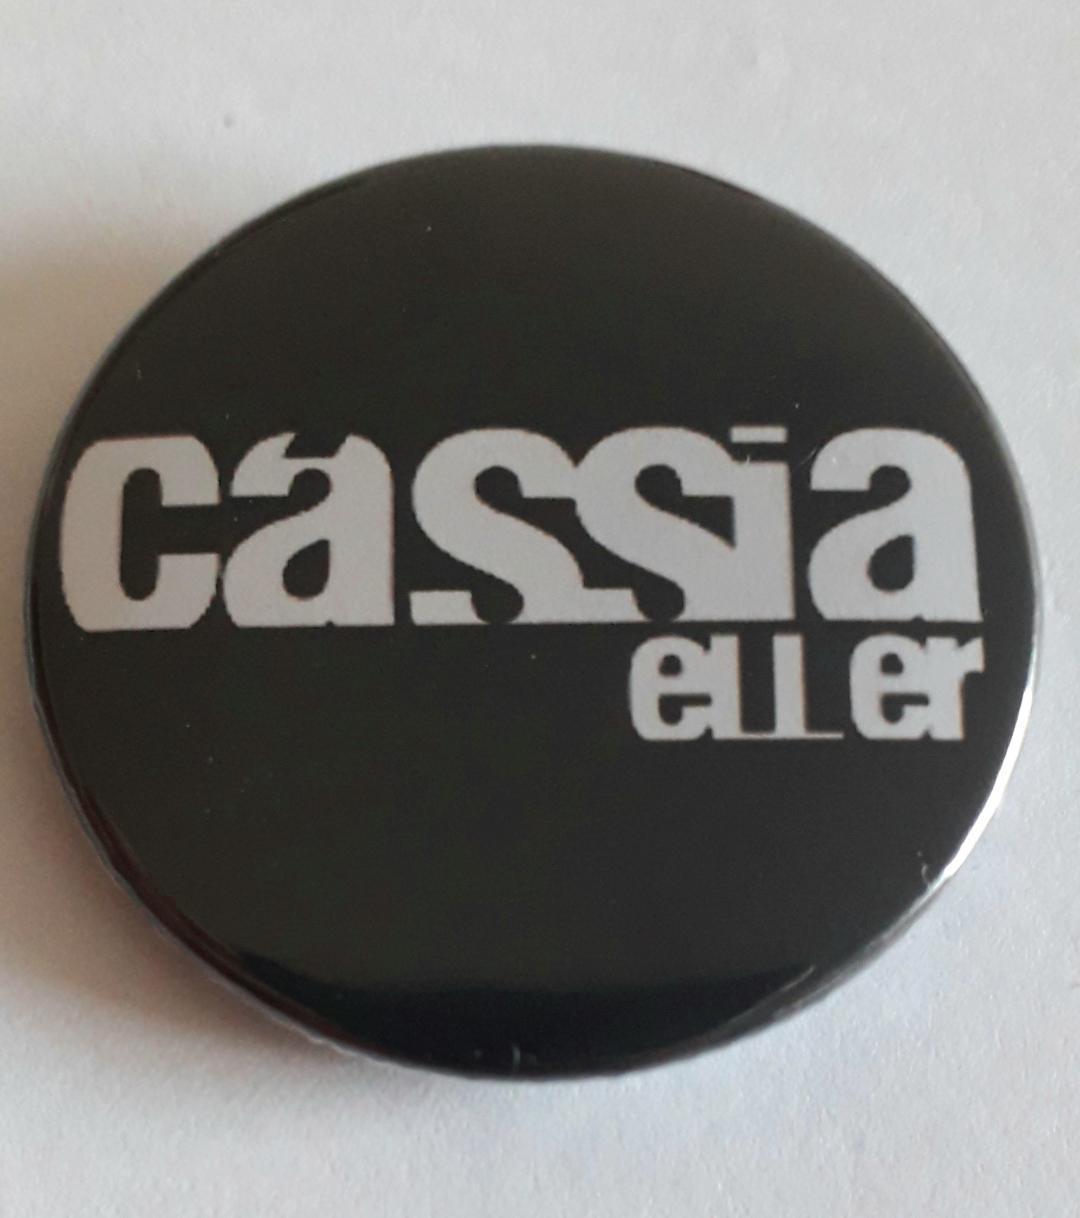 Botton Cássia Eller